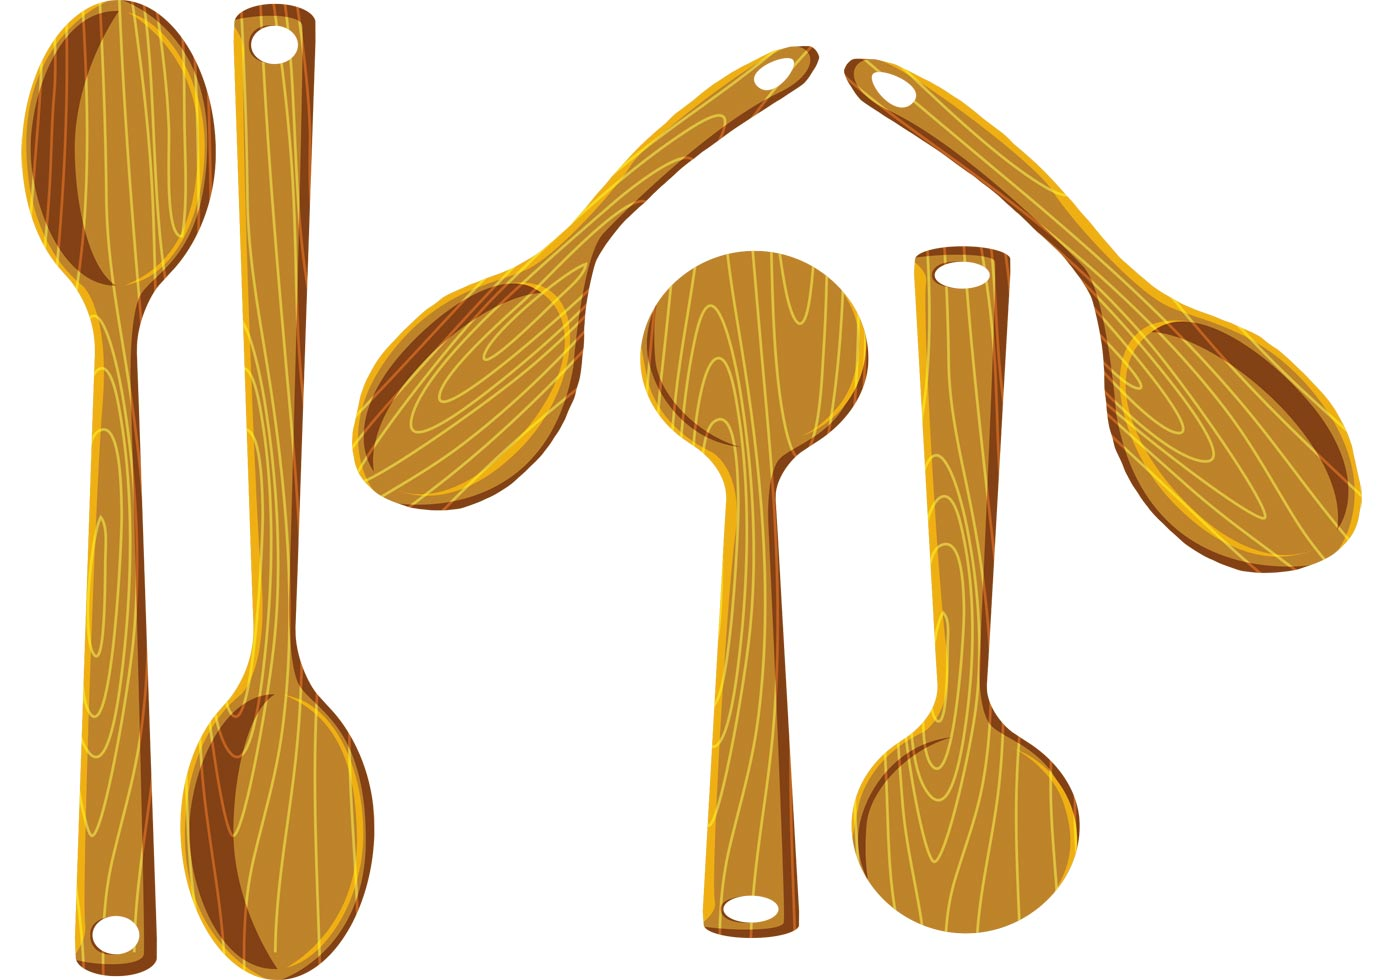 Wood Spoon Vectors - Download Free Vector Art, Stock Graphics & Images